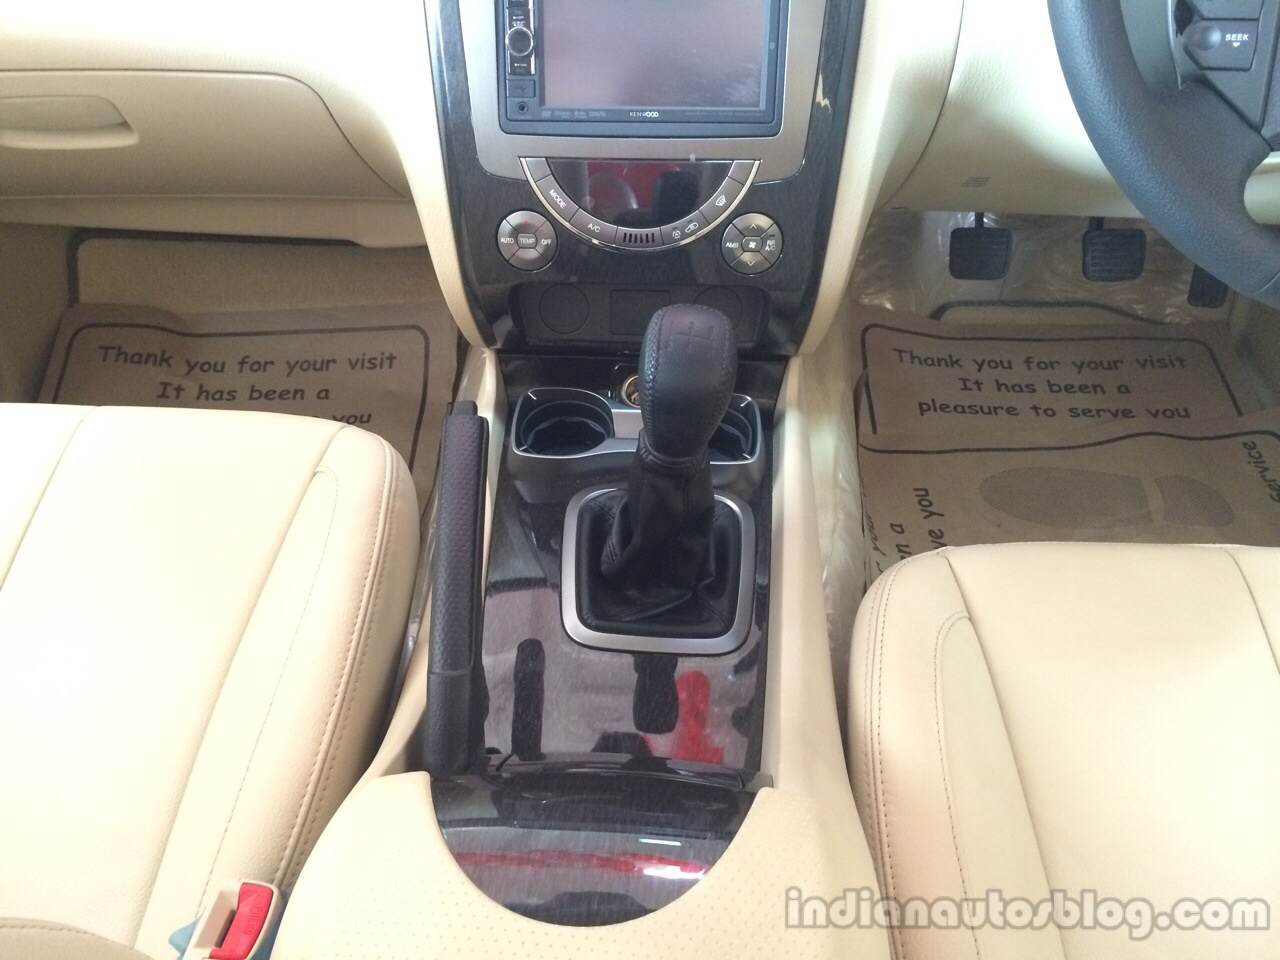 Ssangyong Rexton RX6 manual gearbox